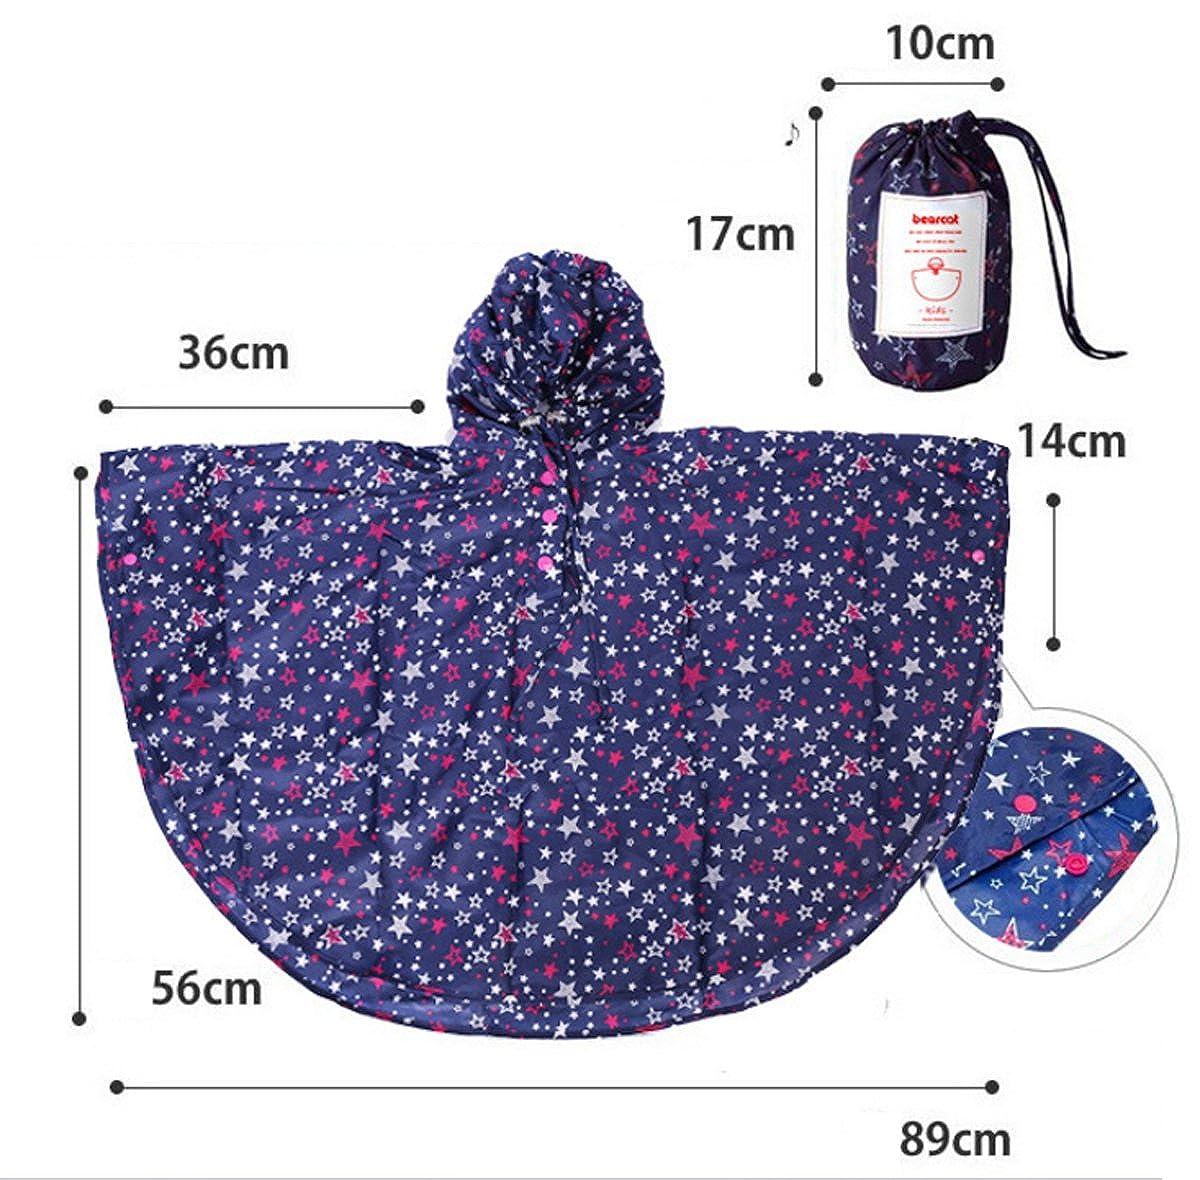 Comfysail Kinder M/ädchen Stern Regenmantel Regenponcho Regenjacke mit Kapuze Wasserdicht Regencape Softshelljacke